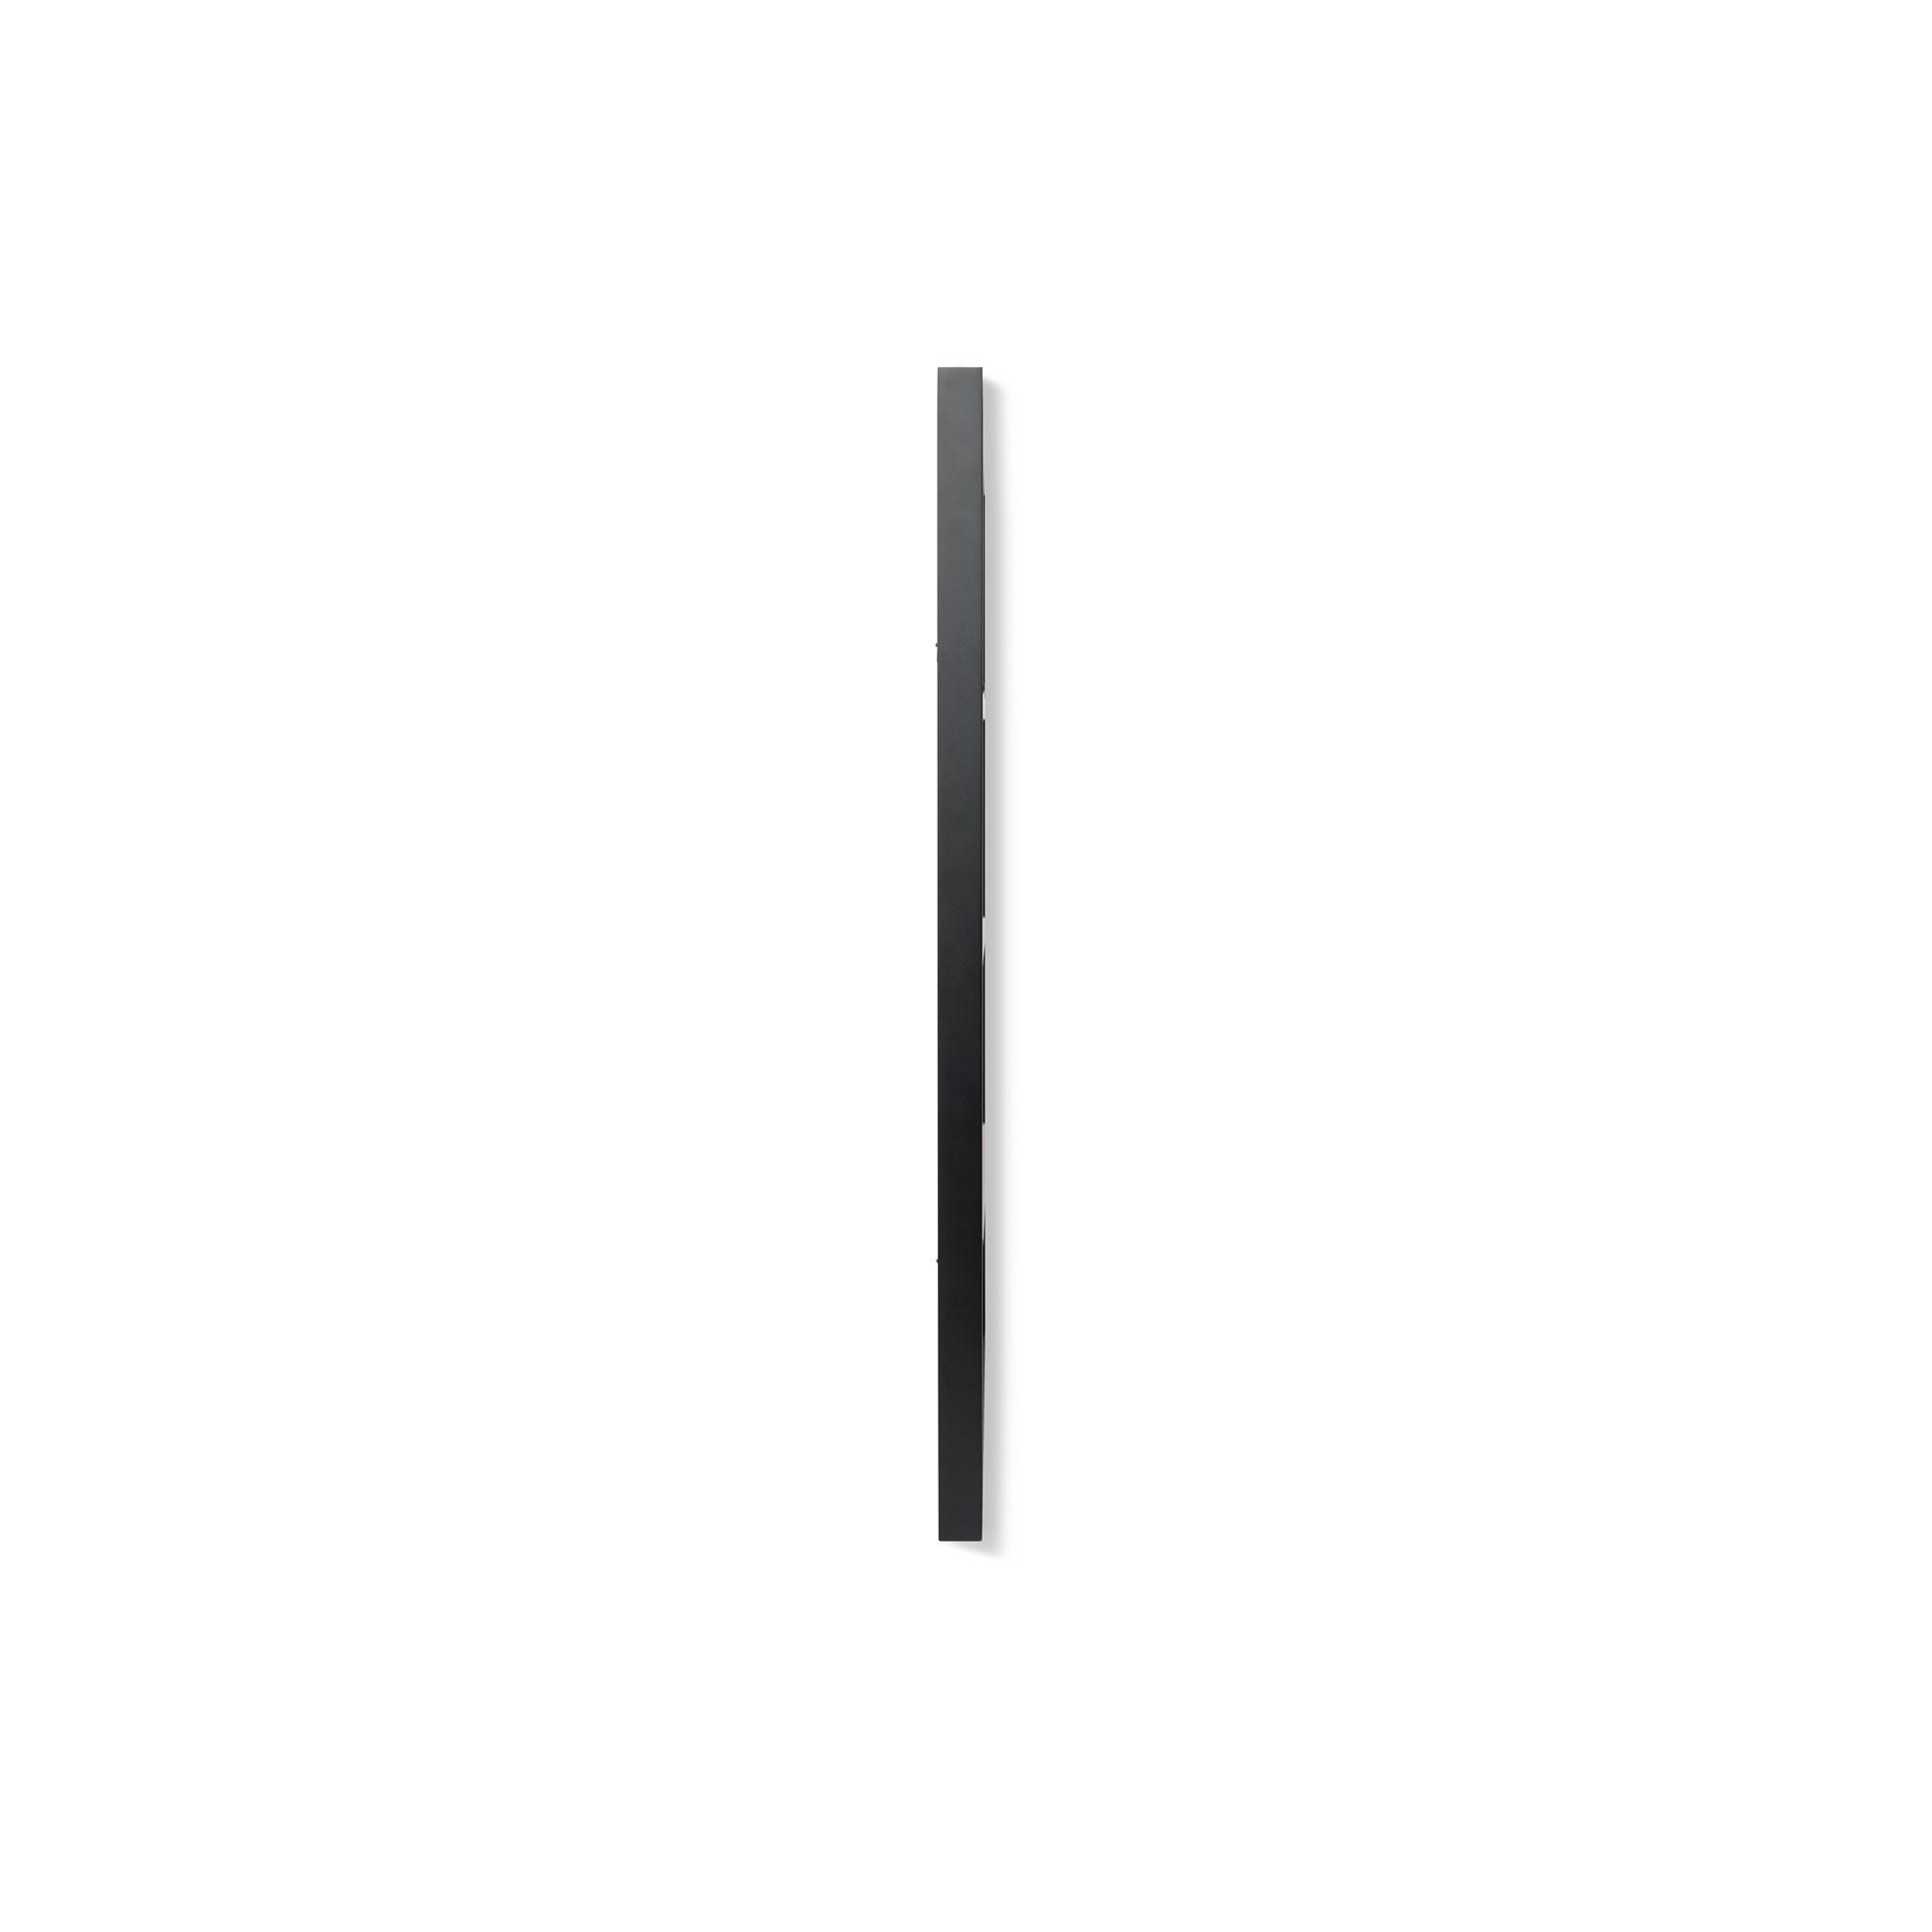 Nástěnný držák na fotografie TUCKER - černý_4